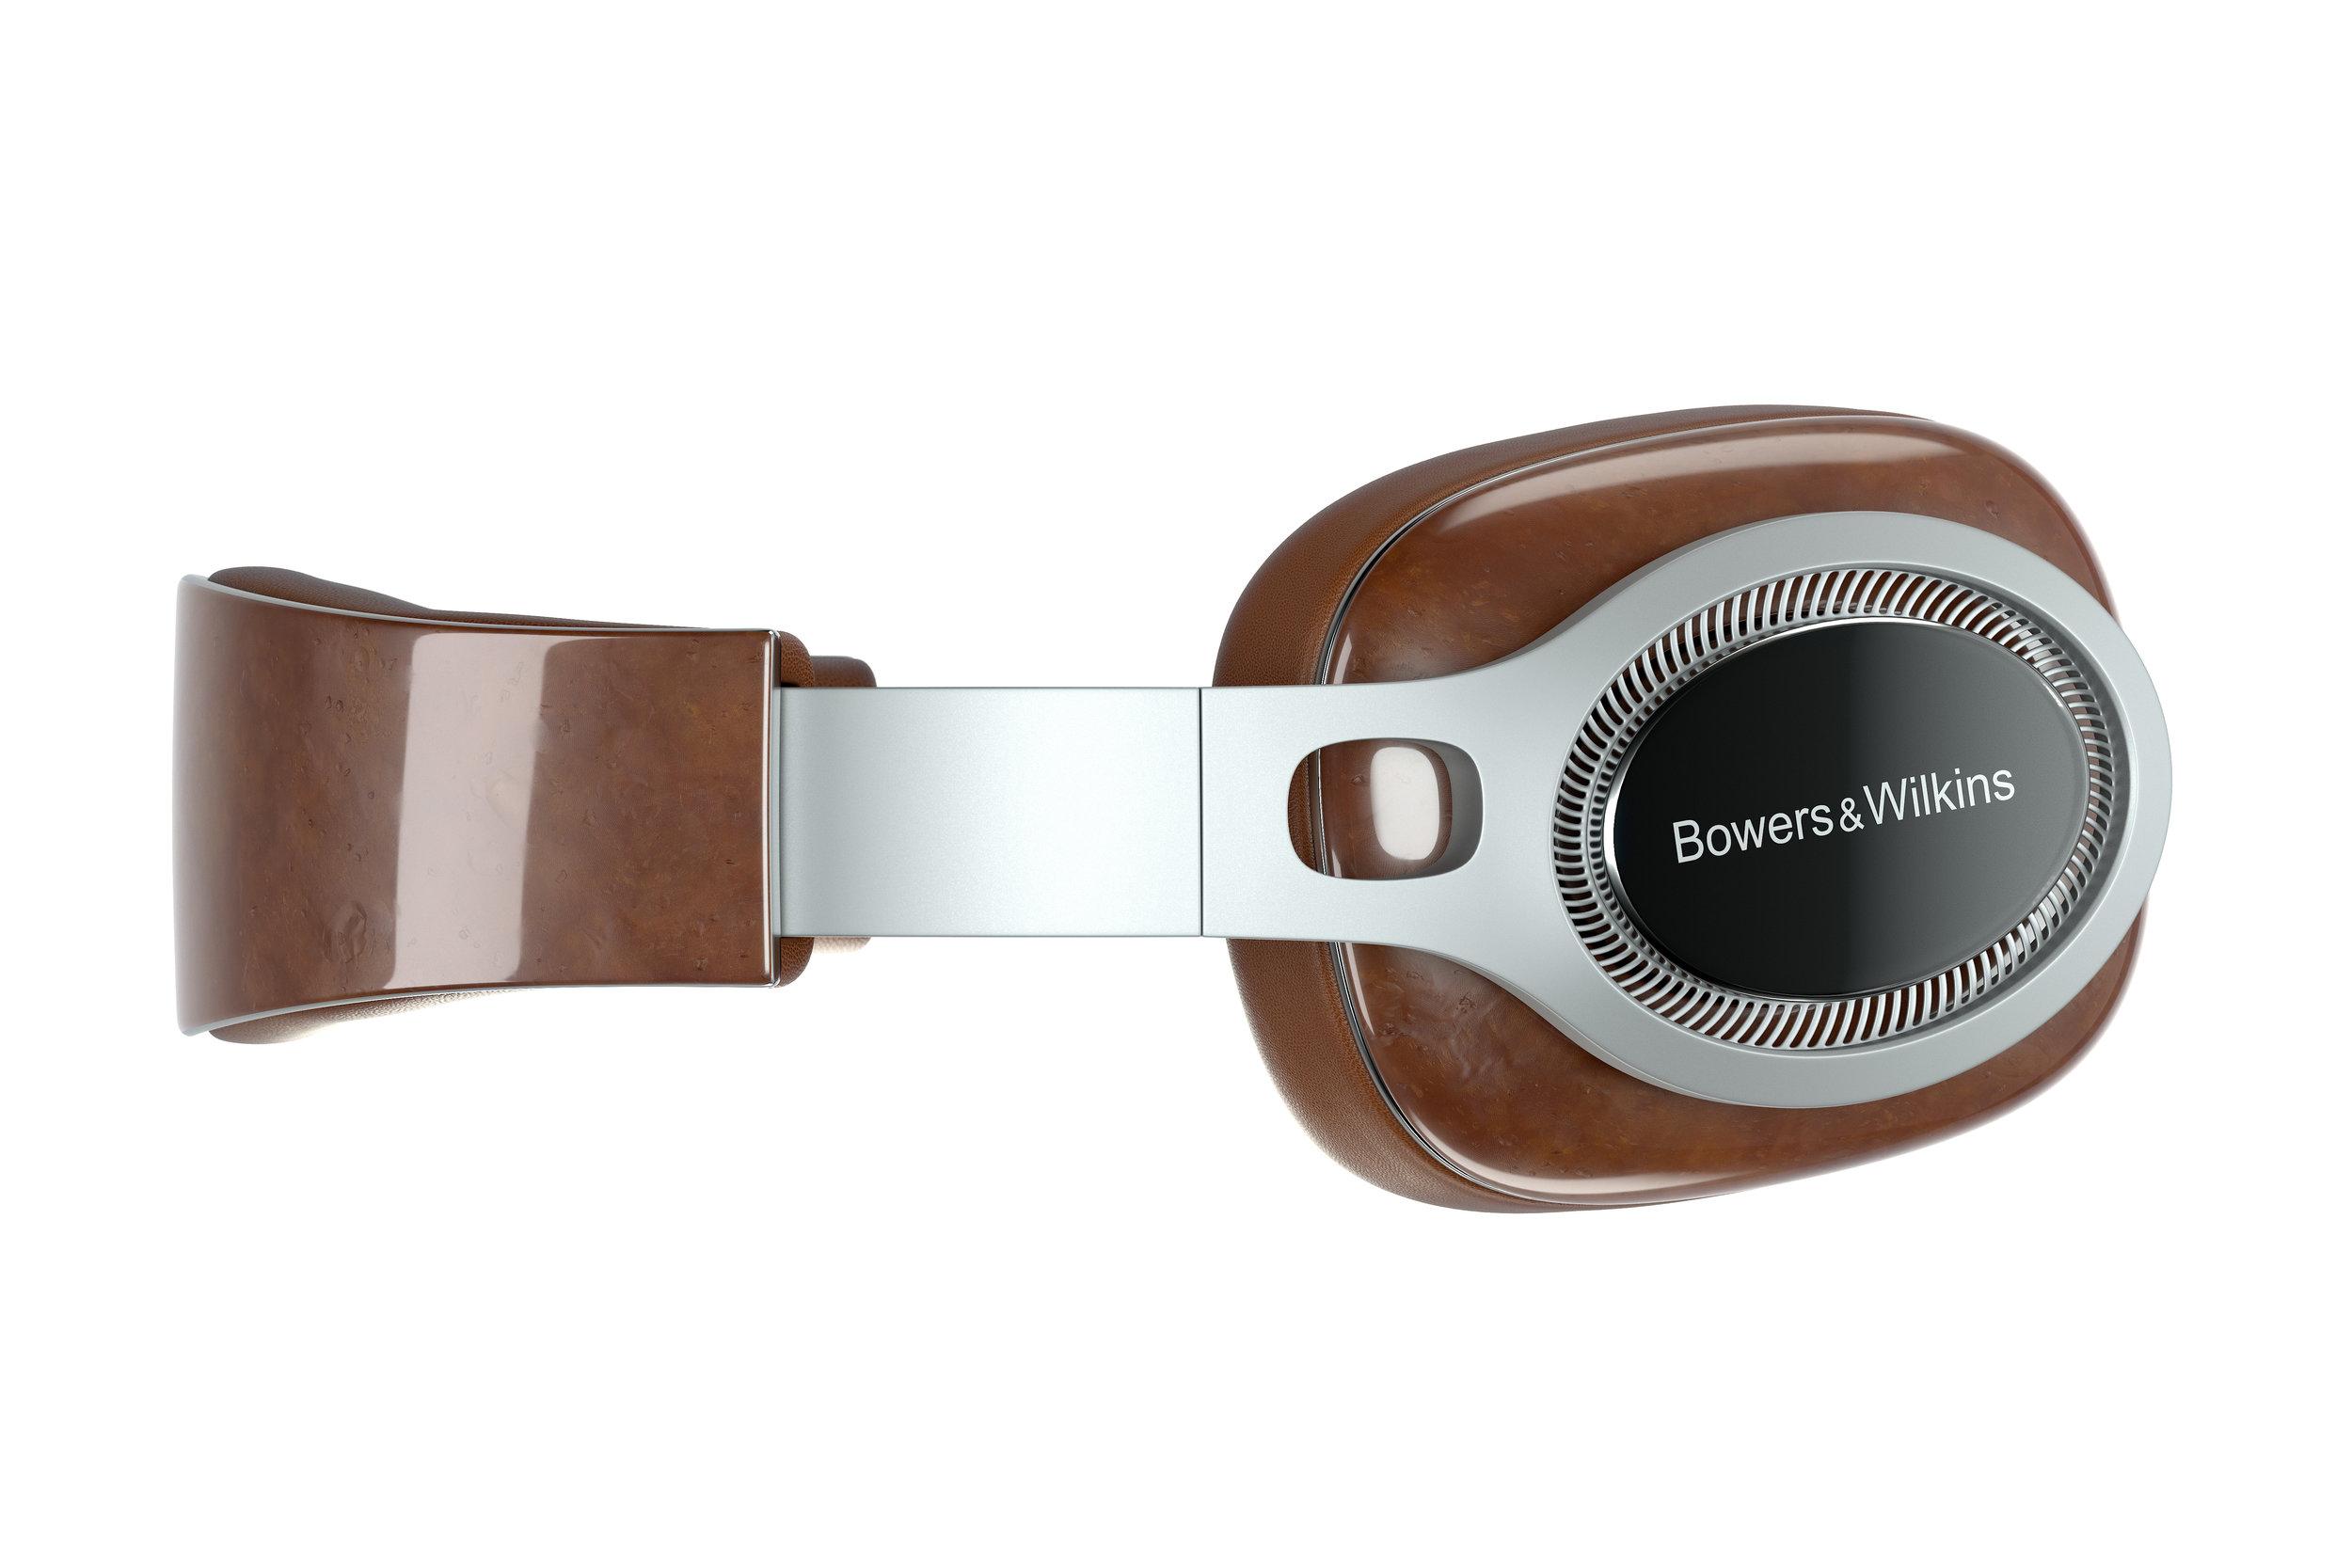 Headphones Image 04 -